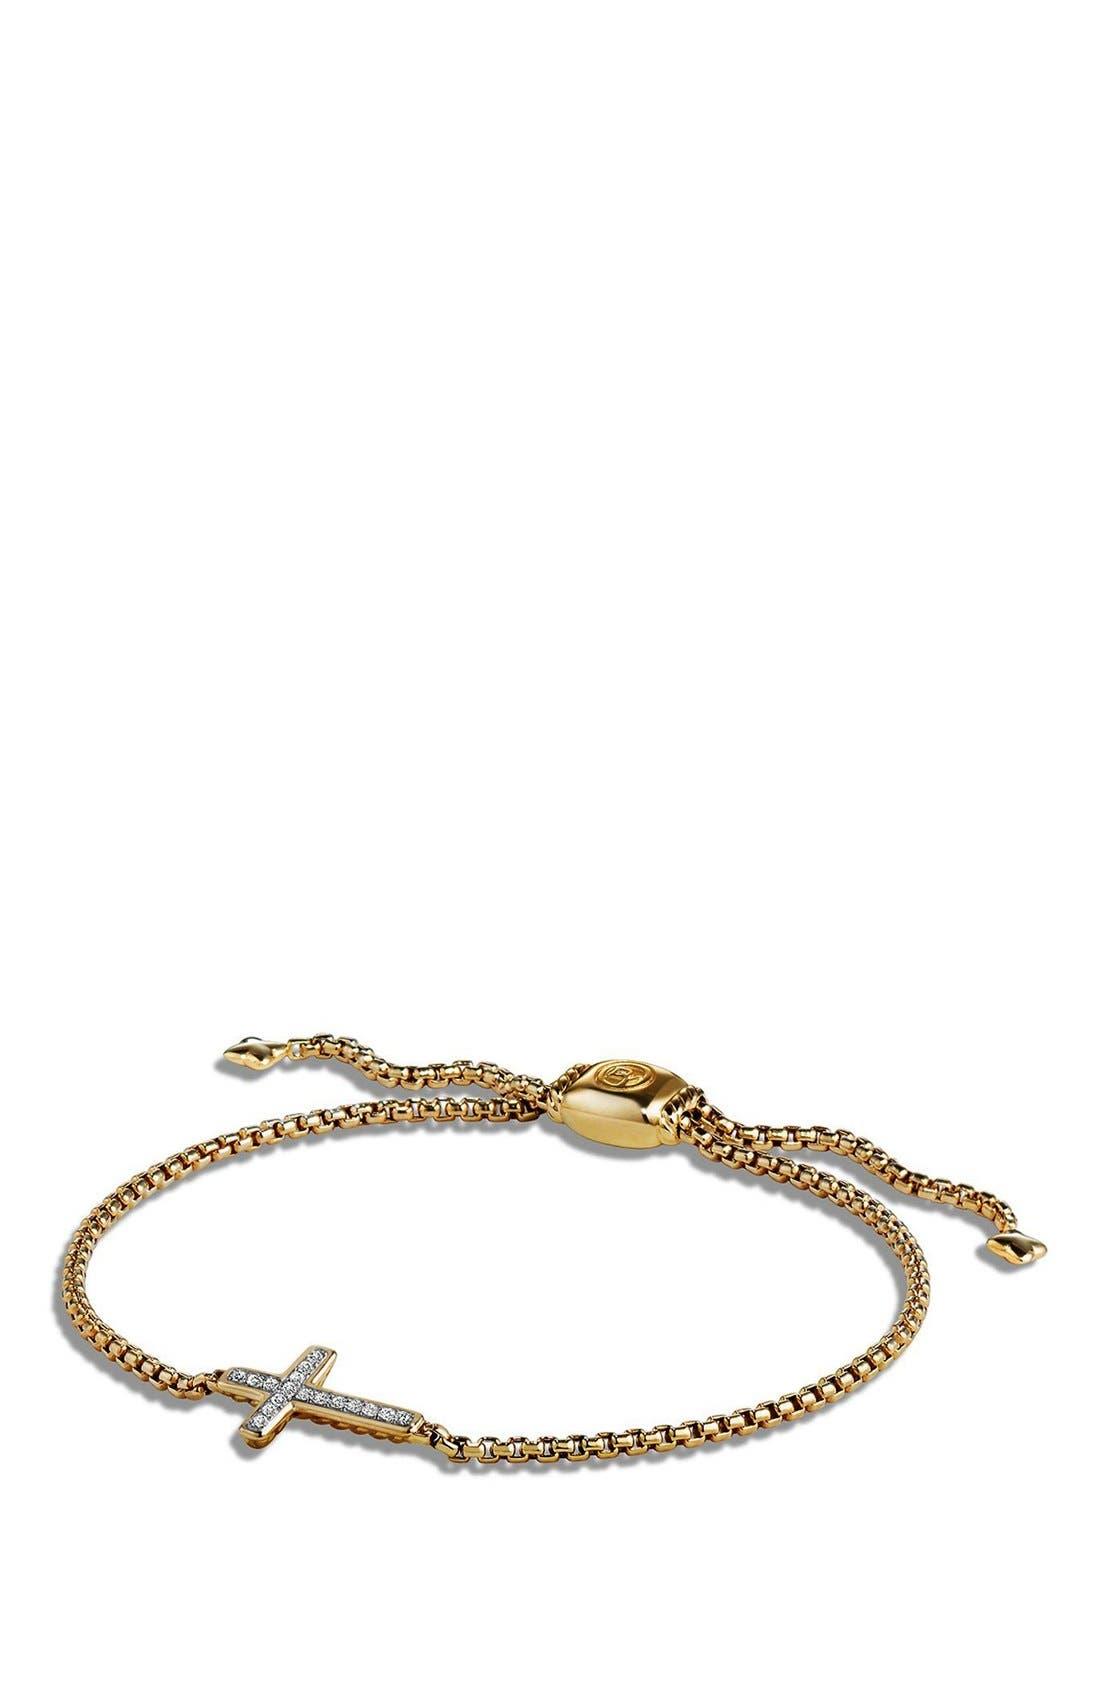 David Yurman 'Petite Pavé' Cross Bracelet with Diamonds in 18K Gold